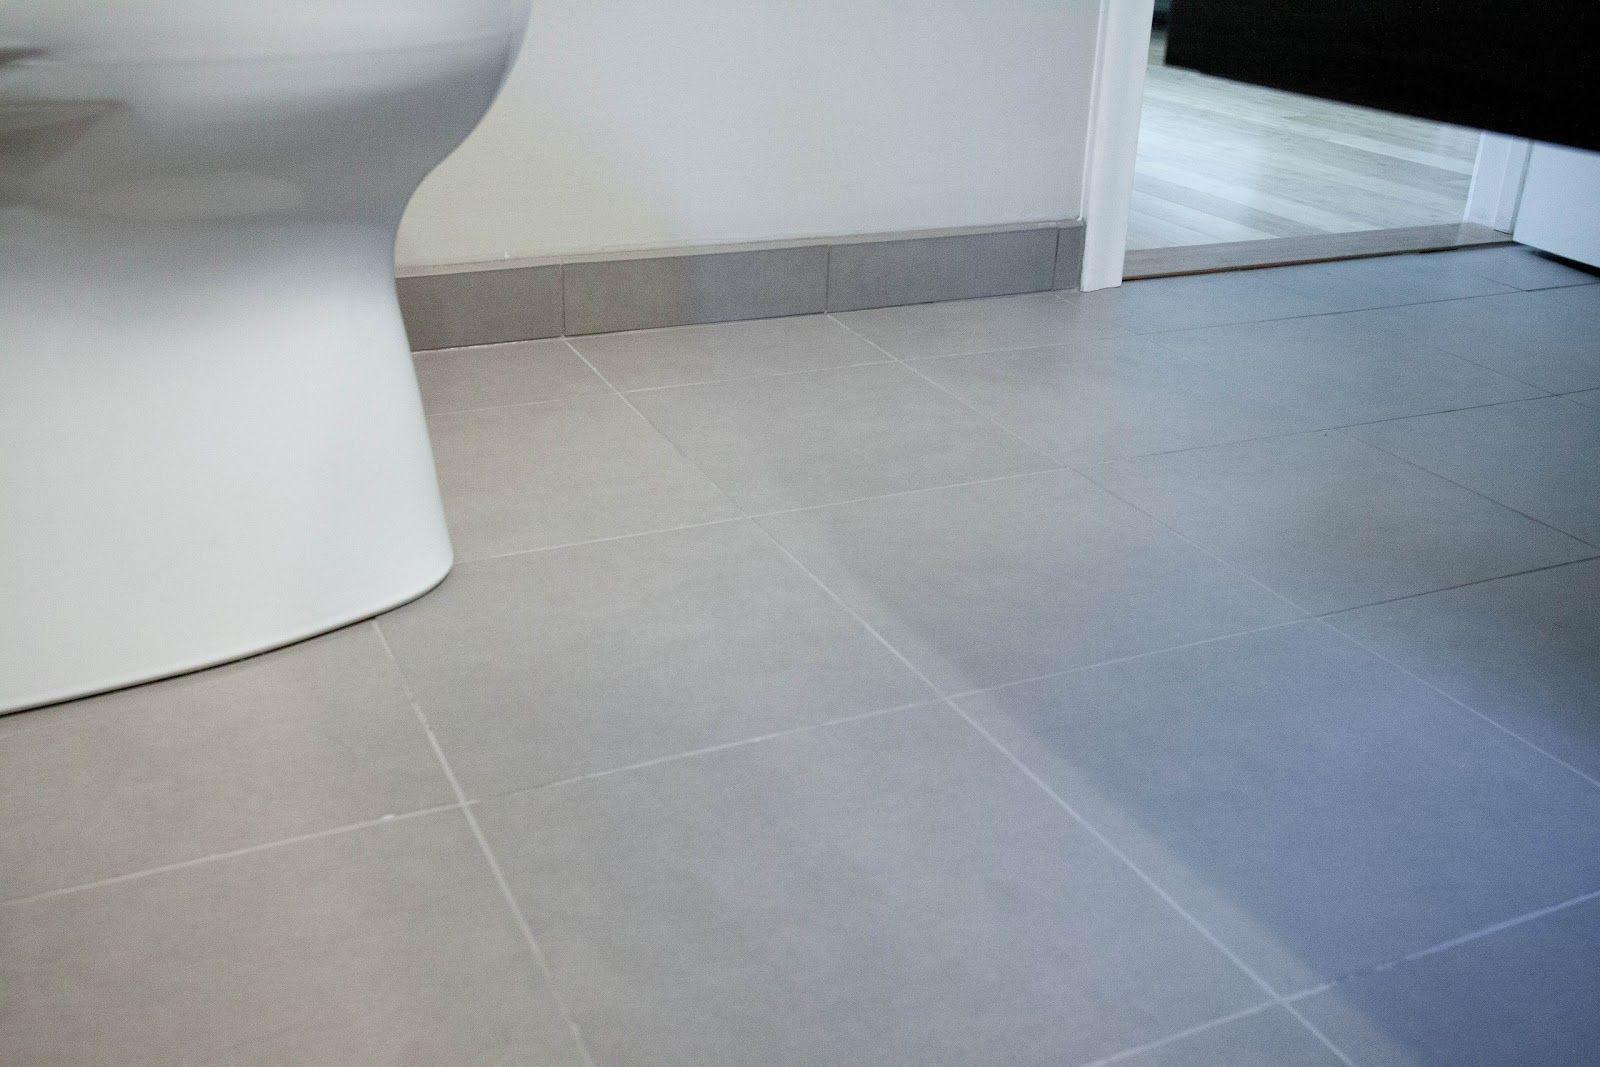 Superior Bathroom Tile Baseboard Ideas Part - 8: Bathroom Tile Baseboard Ideas